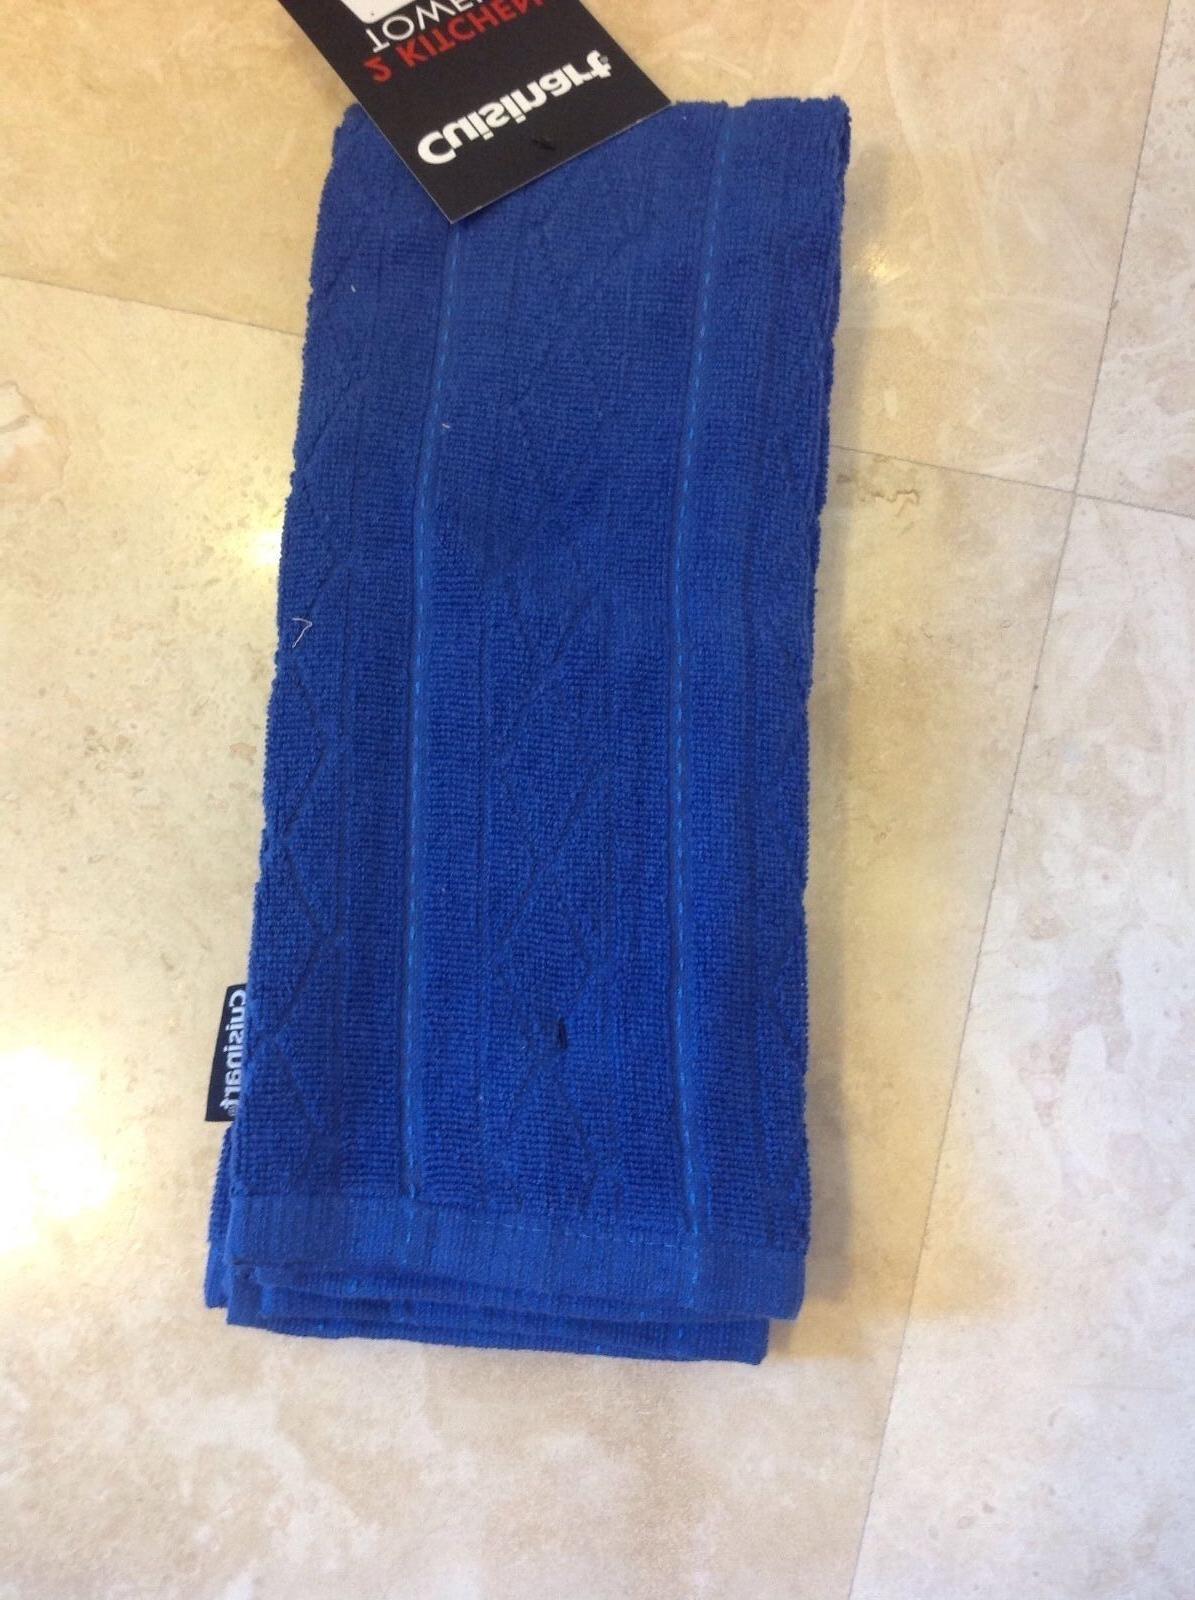 CUISINART 2 PACK KITCHEN TOWELS ROYAL BLUE DIAMOND 100% COTT